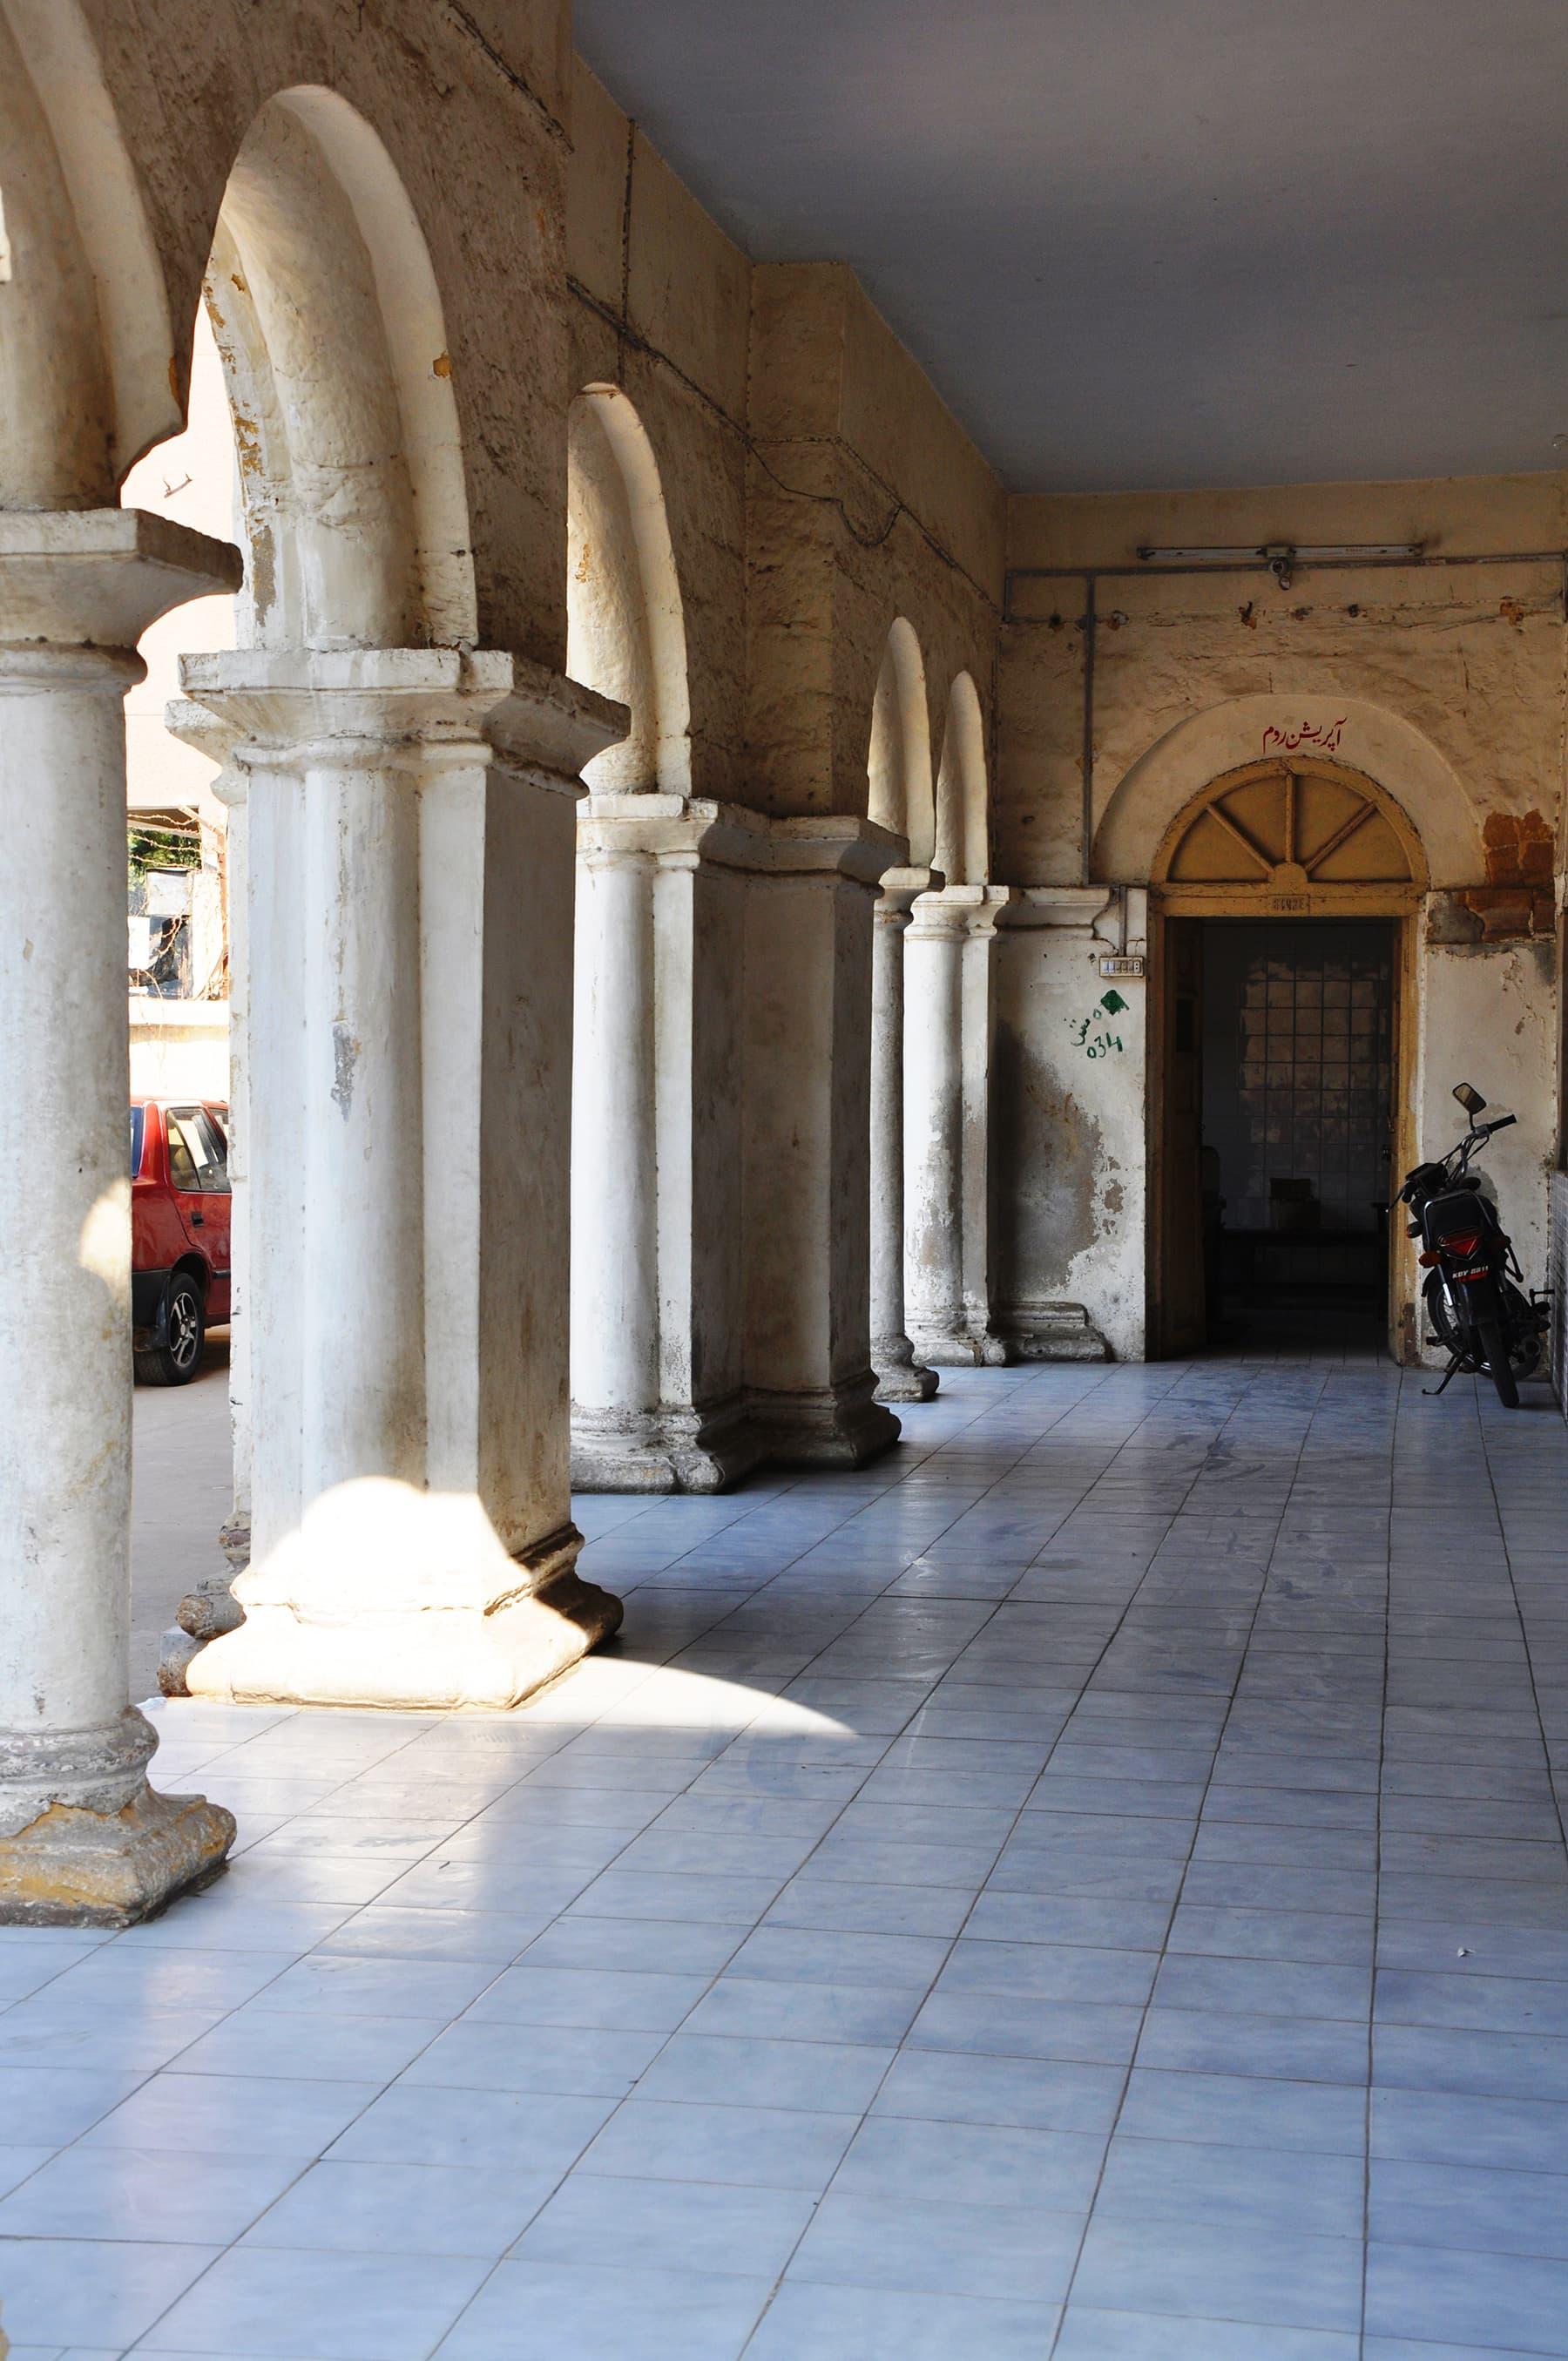 A corridor at the hospital.